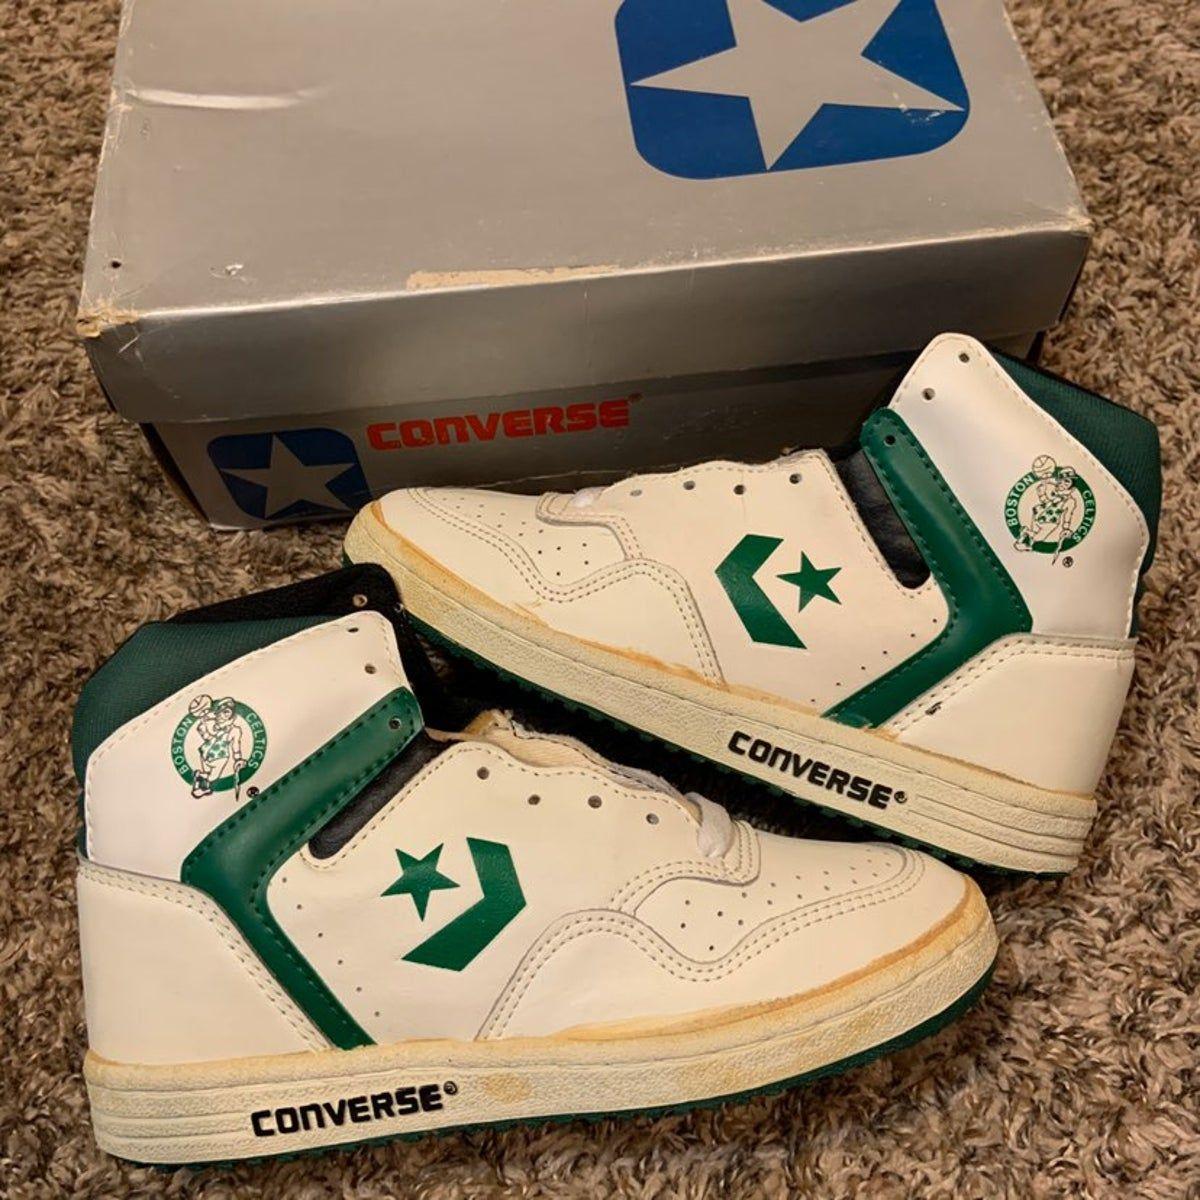 Negrita chocar Todopoderoso  vintage 80s nba boston celtics converse in 2020 | Converse, Converse nba,  Vintage sneakers